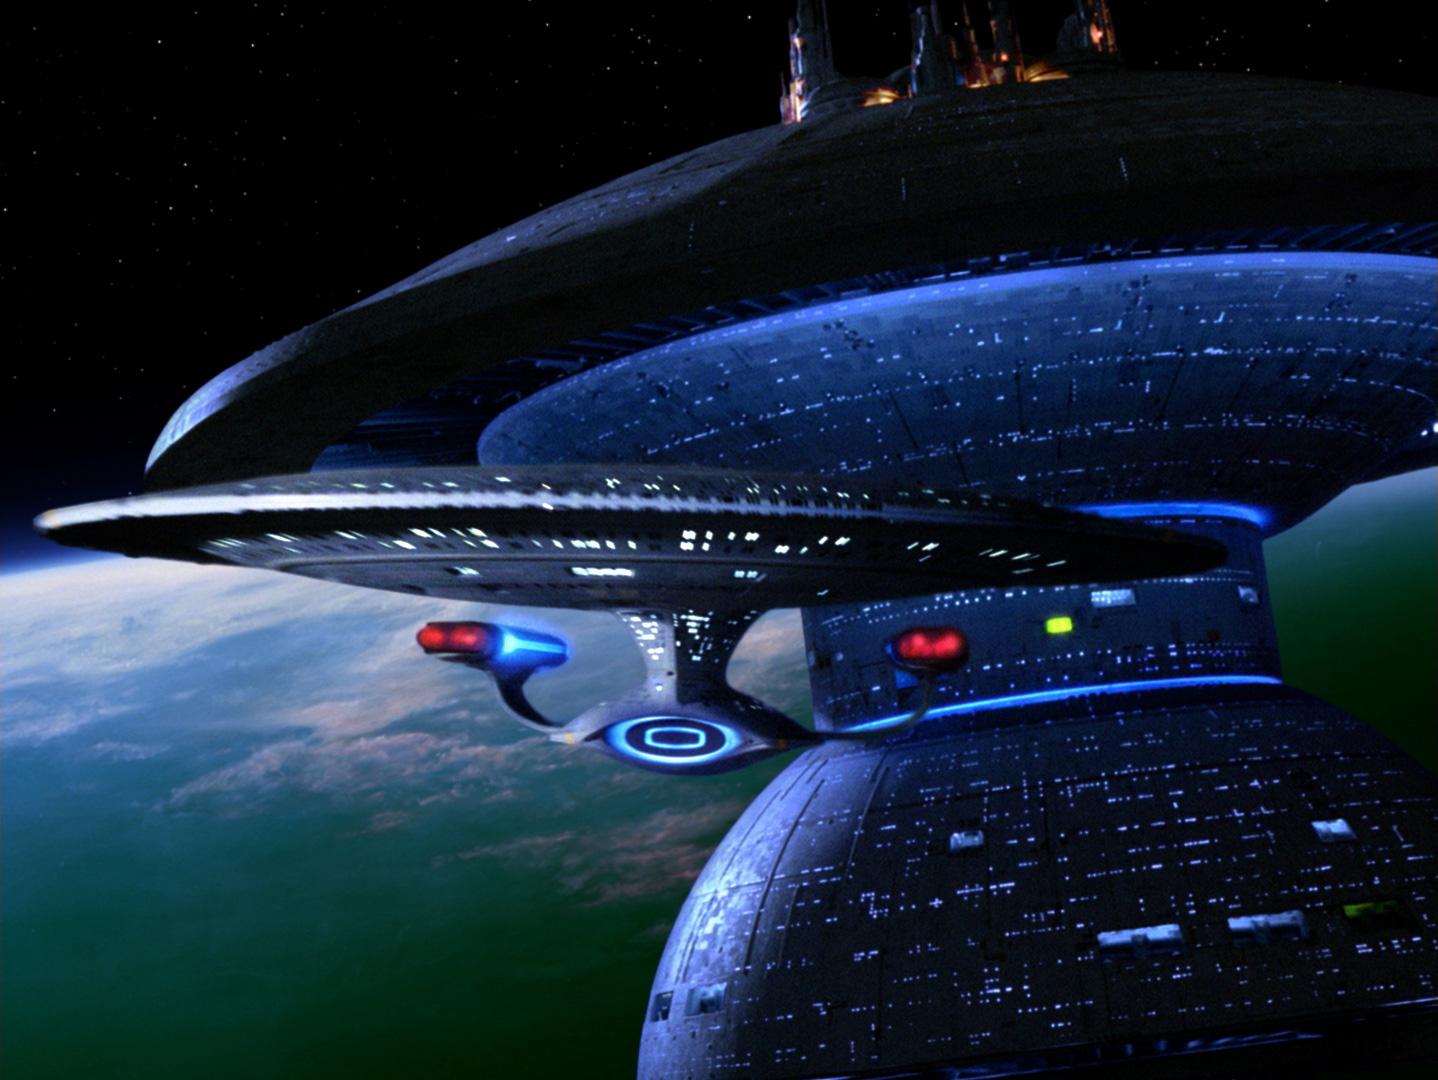 Star trek the next generation images tng crew hd wallpaper and - Exclusive Star Trek The Next Generation Season 4 Blu